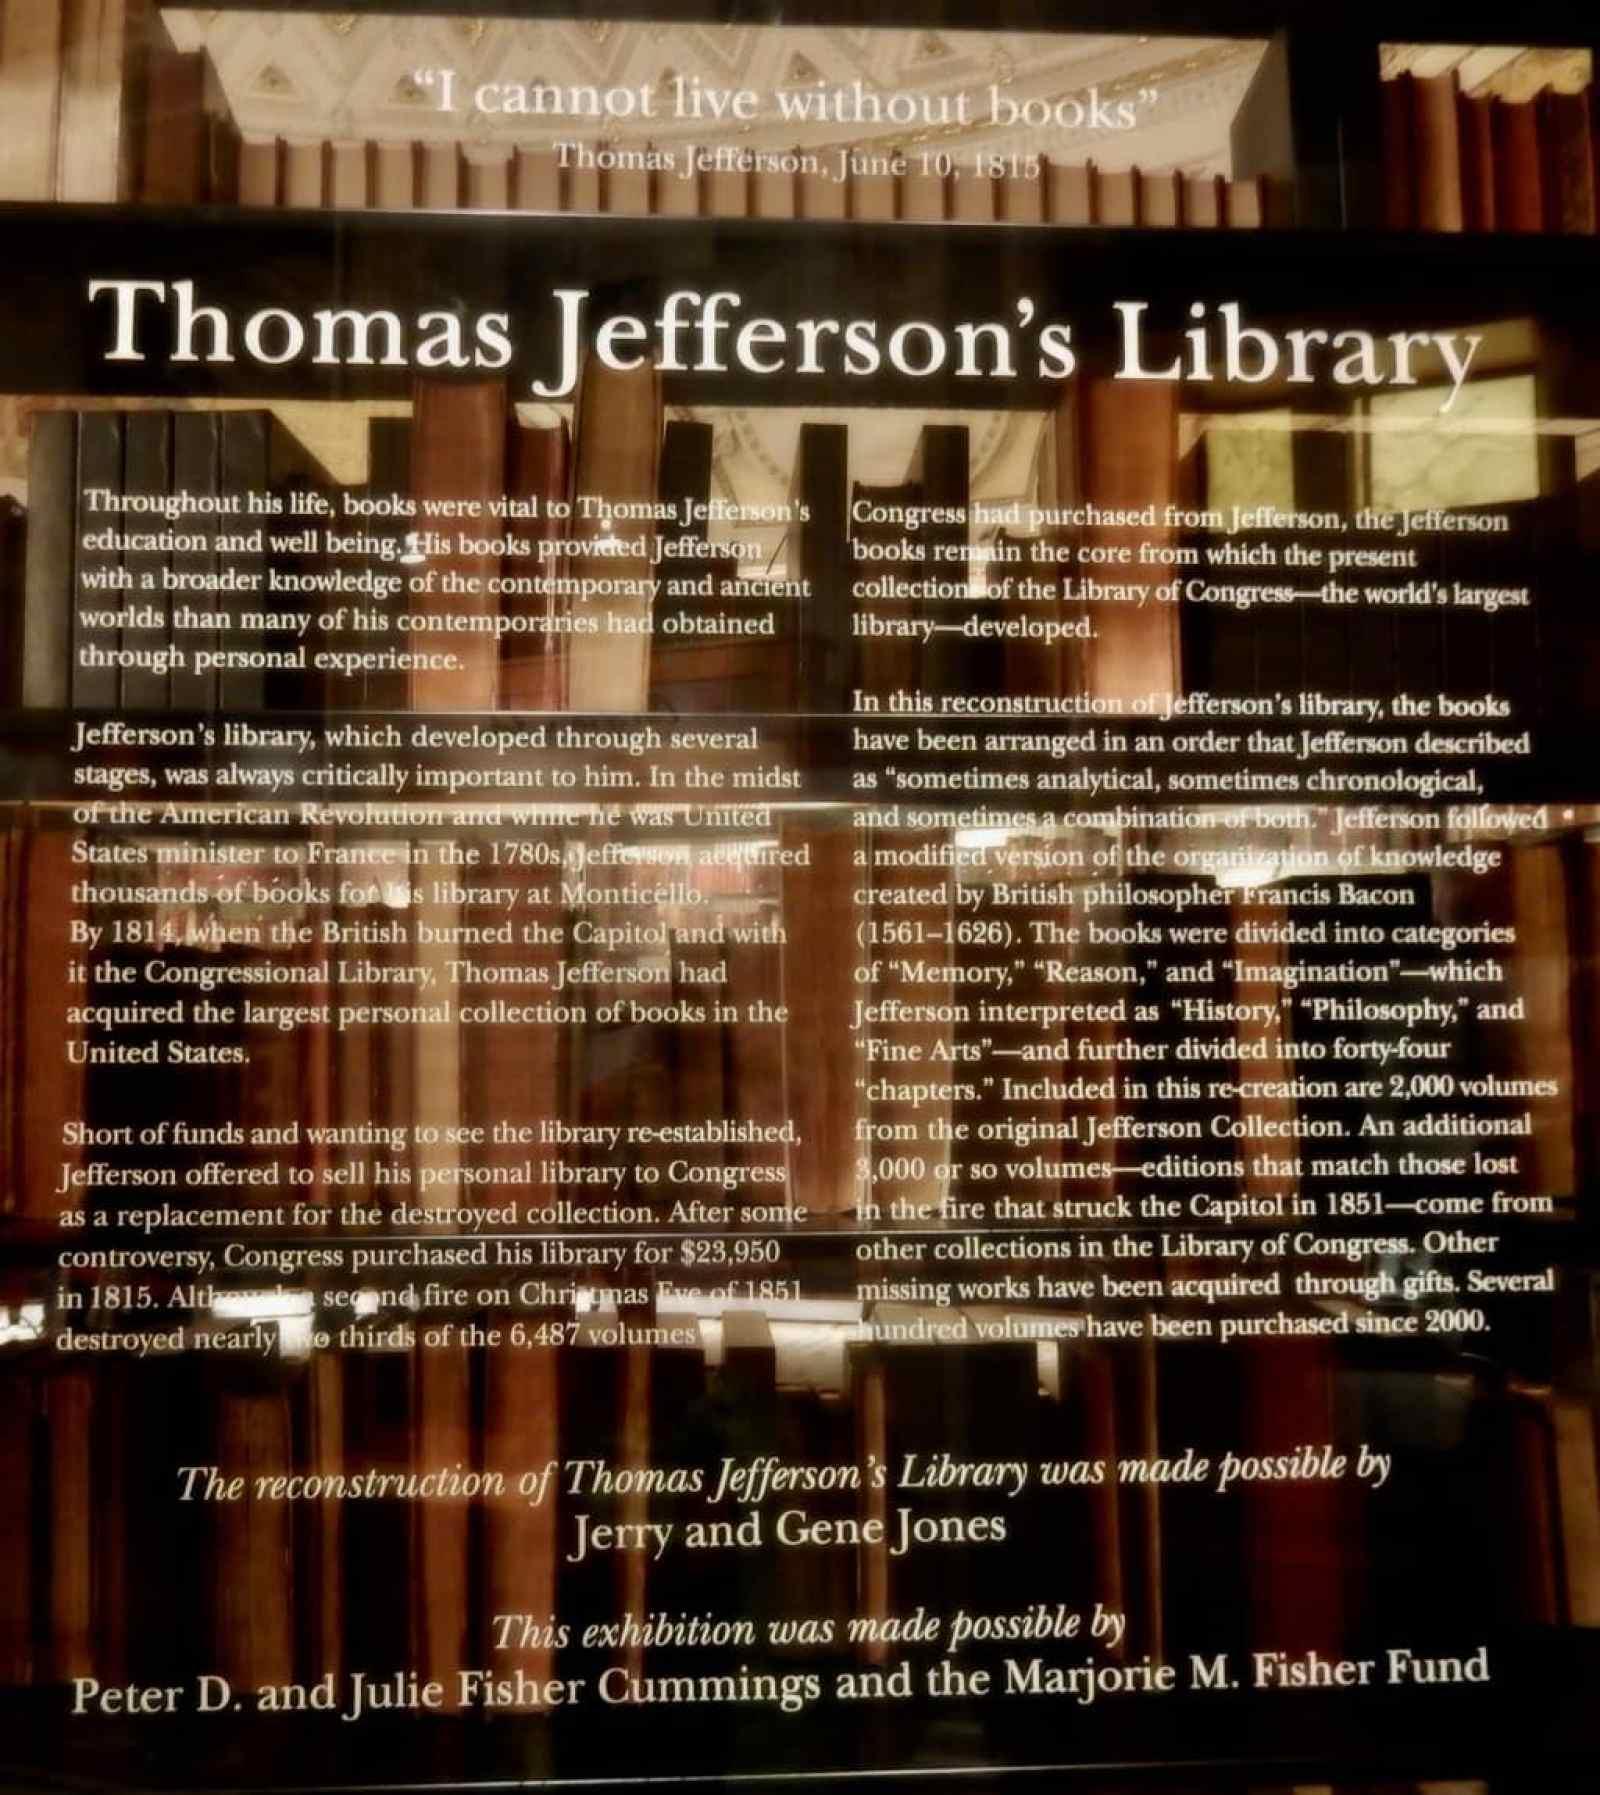 Thomas Jefferson Library - Library of Congress Washington DC